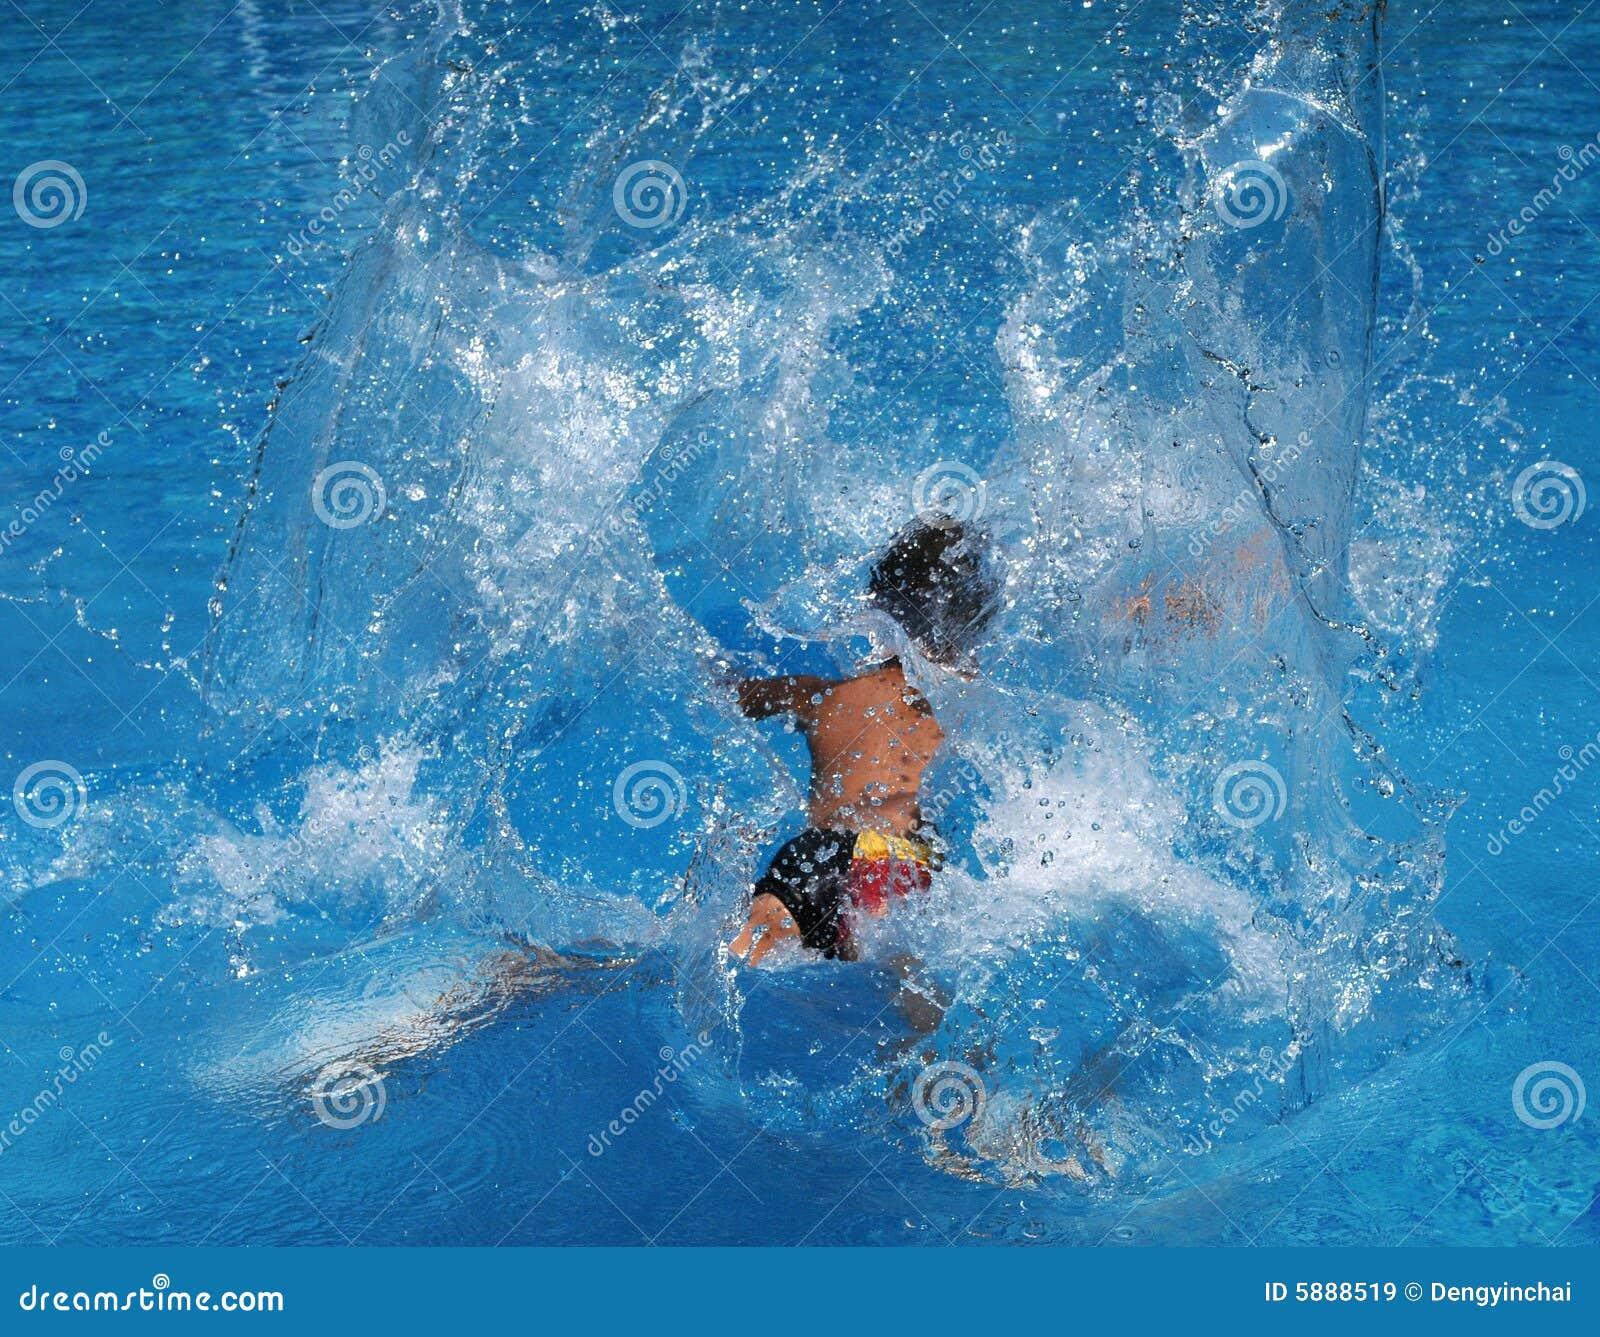 Pool Water Splash: Splash In The Swimming Pool Stock Image